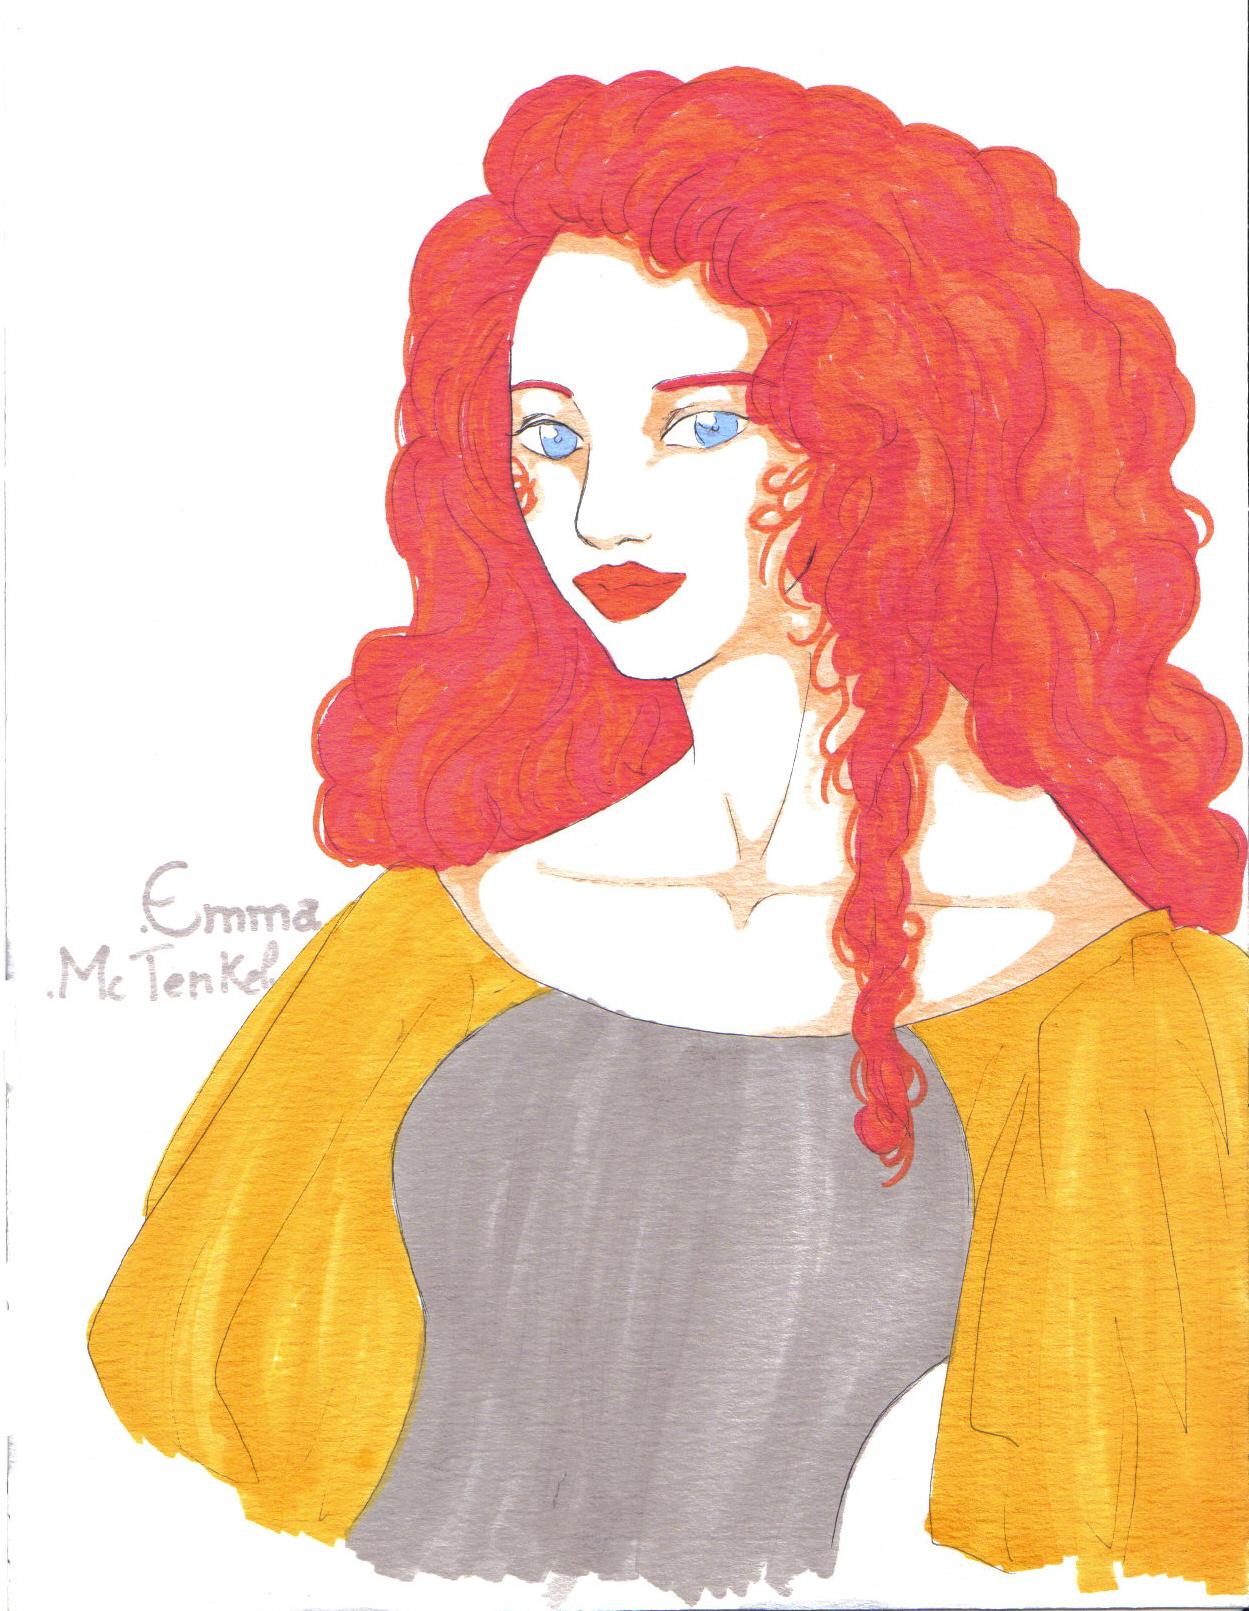 Emma Mc Tenkel